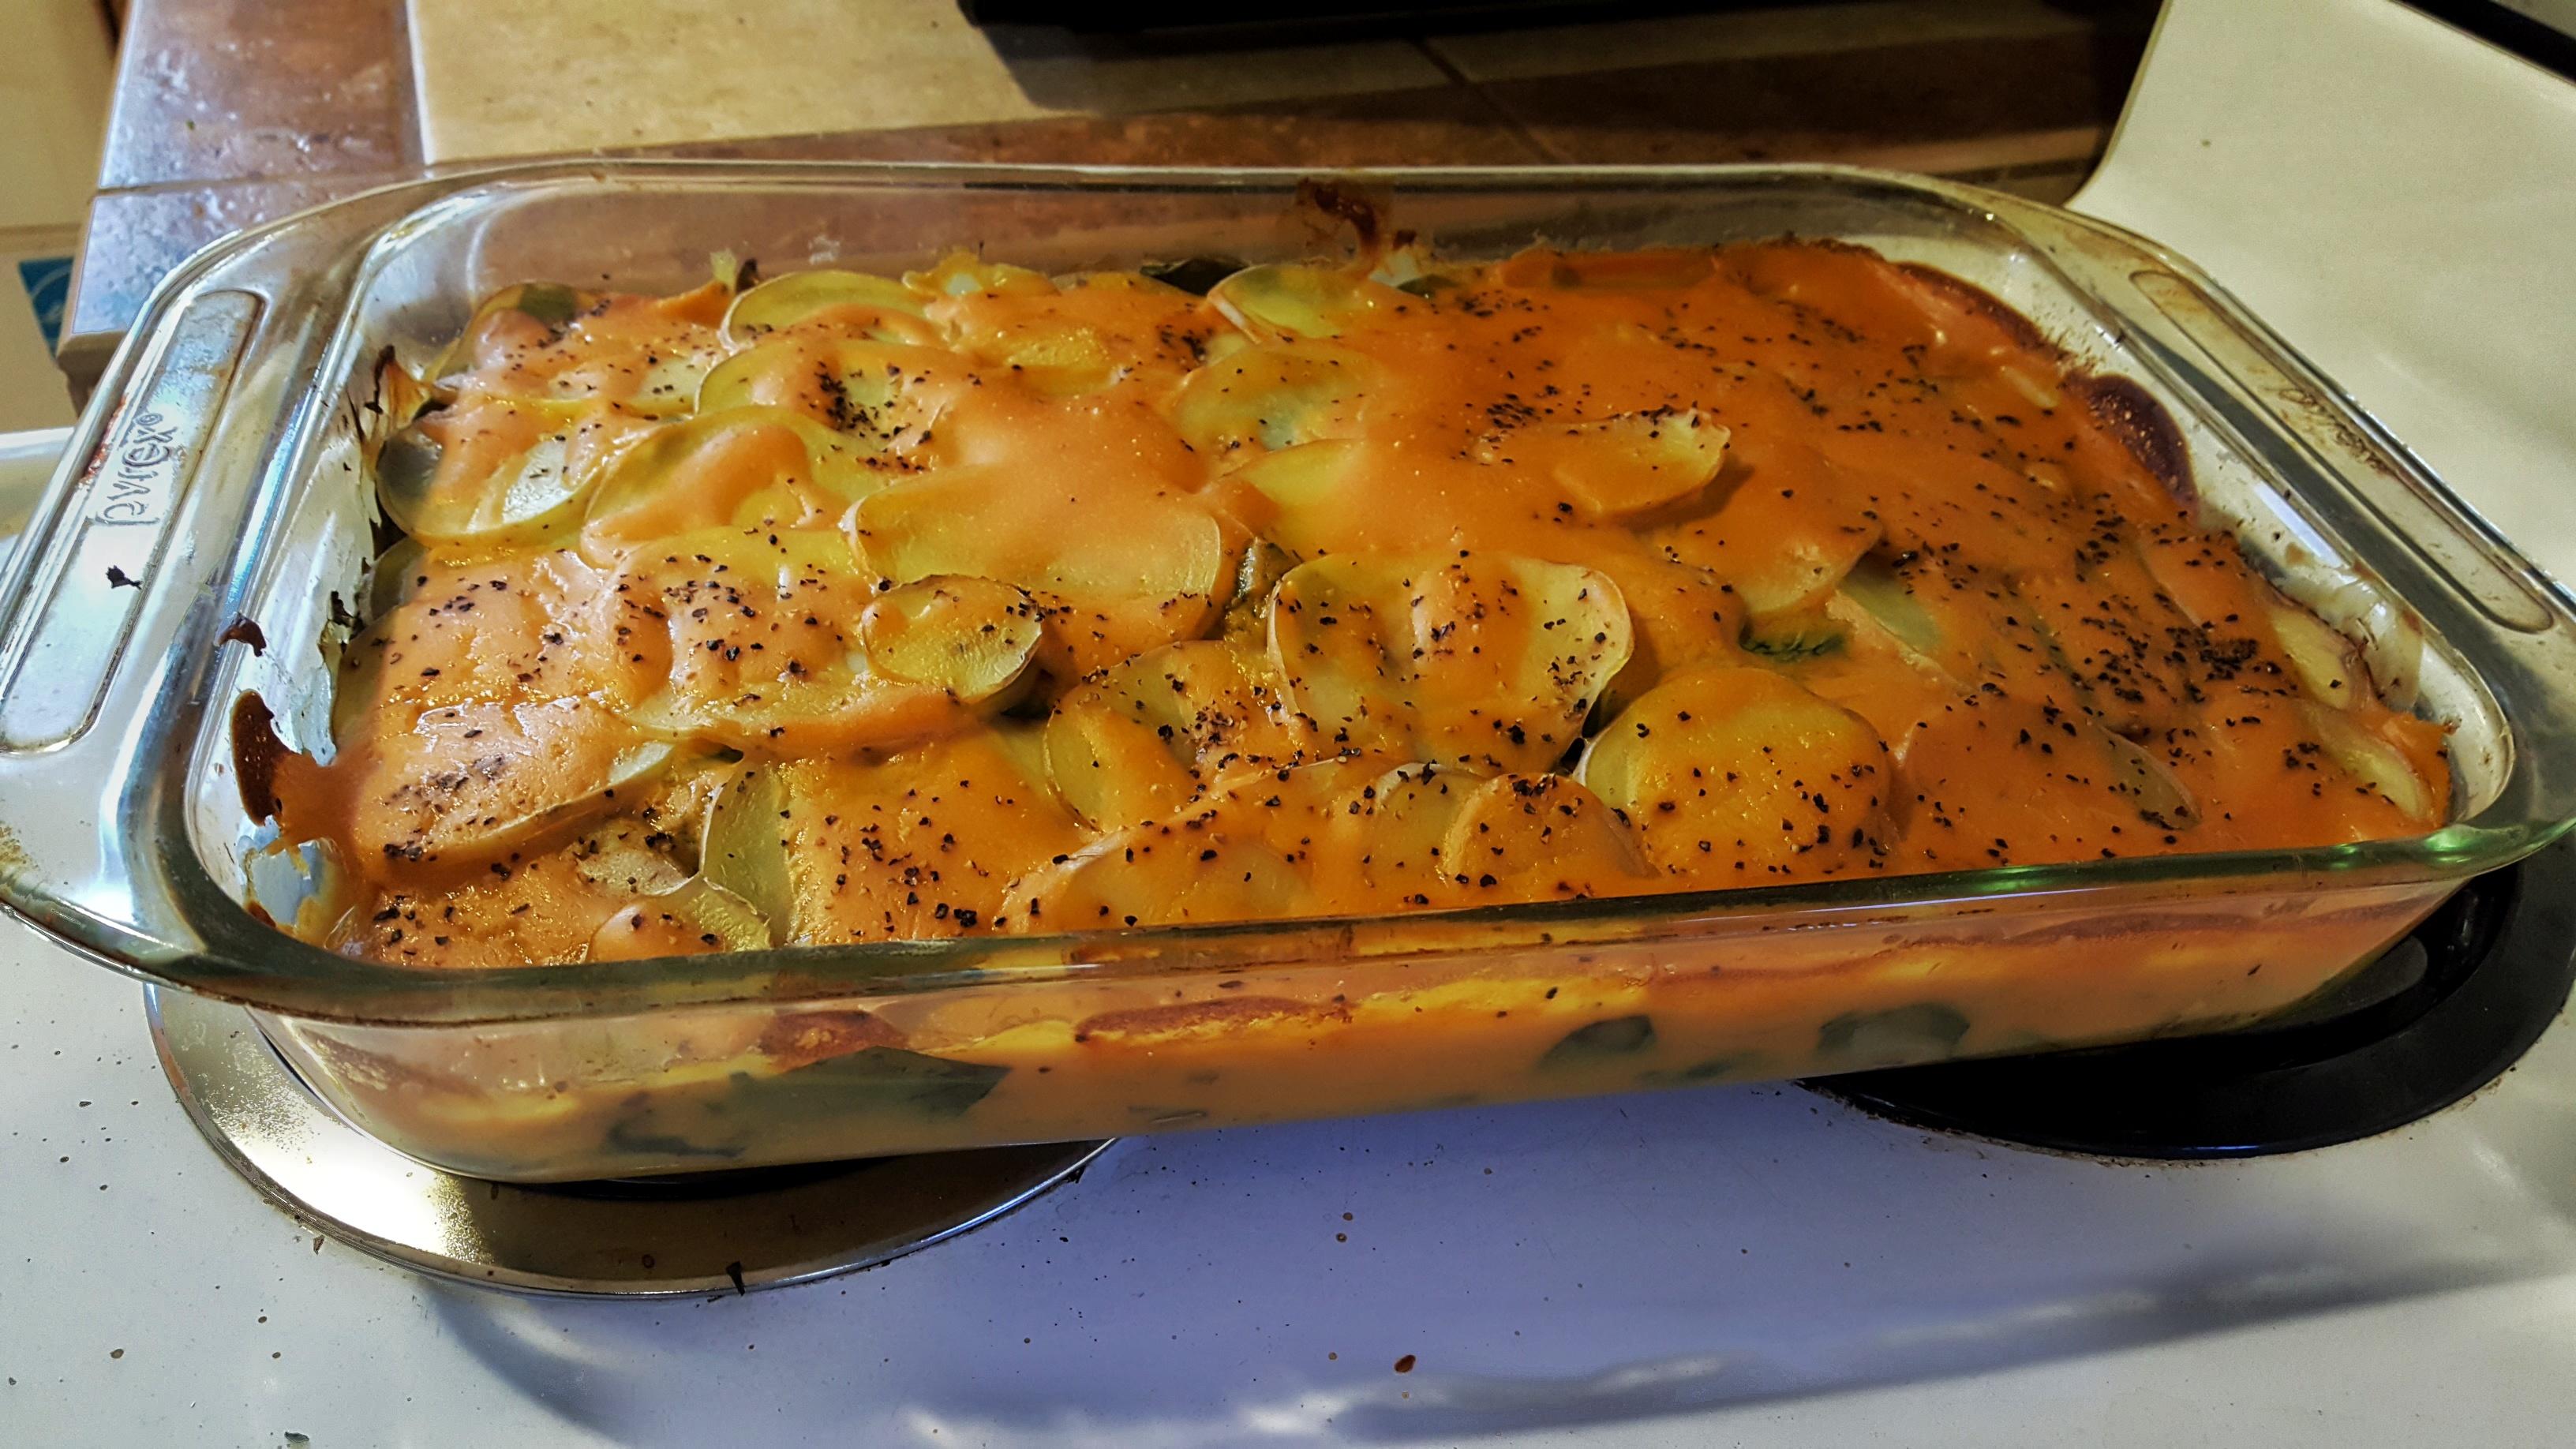 Vegan Scalloped Potatoes with Mushrooms and Collard Greens